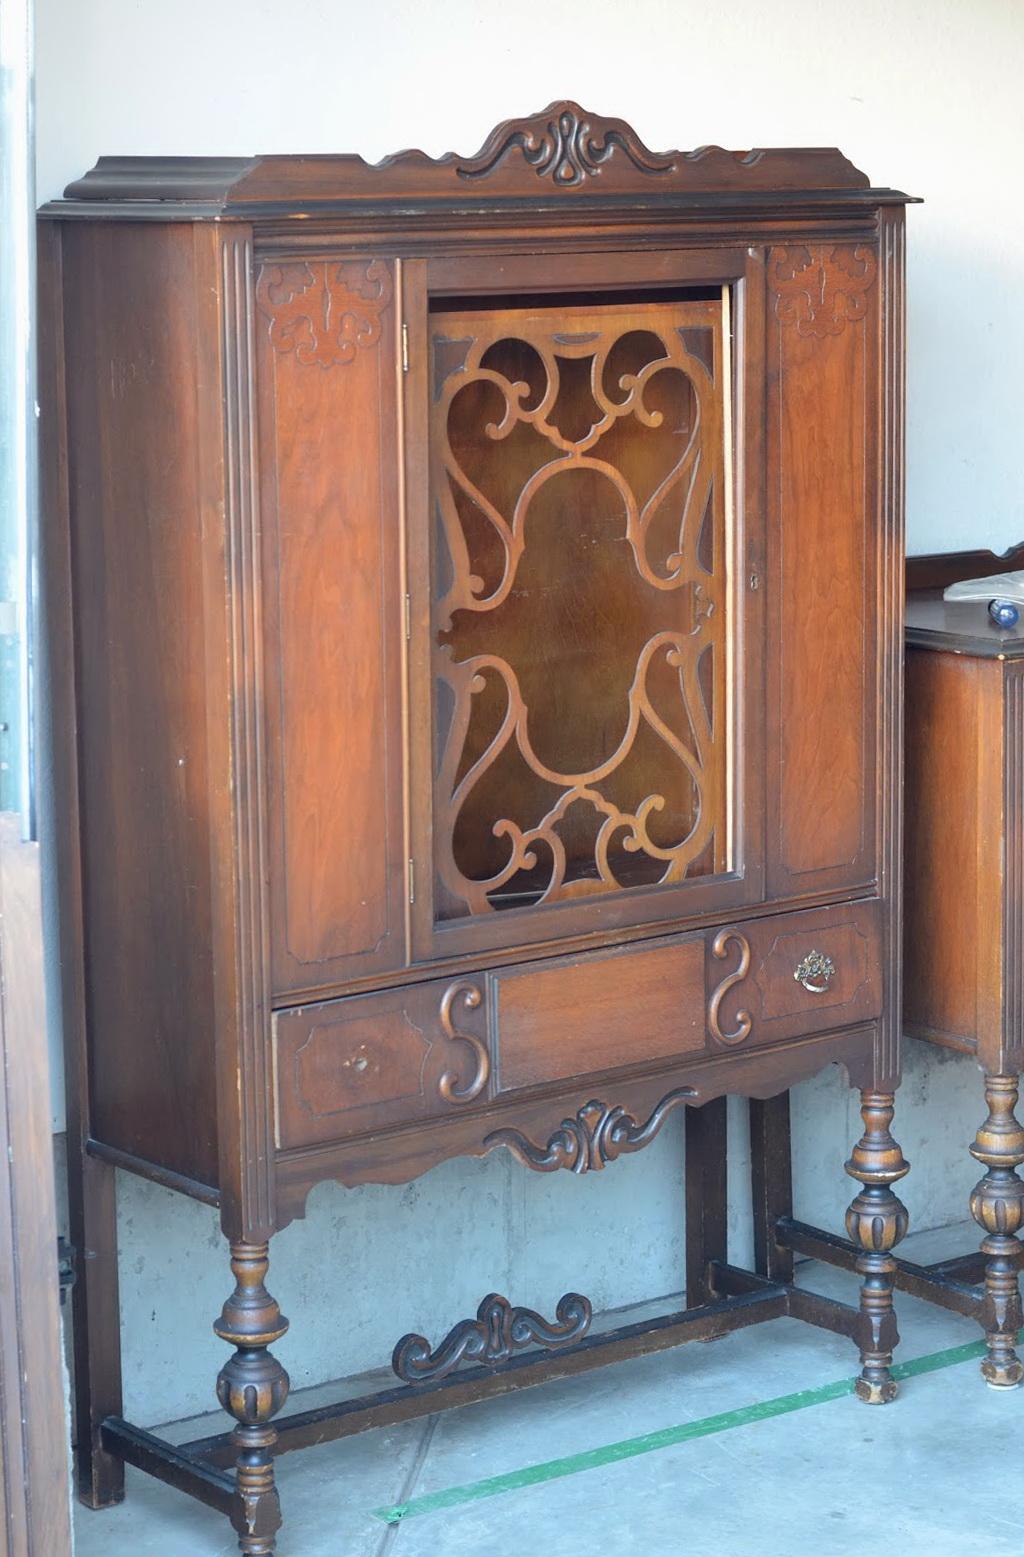 Antique China Cabinet Prices - Antique China Cabinet Prices Home Design Ideas